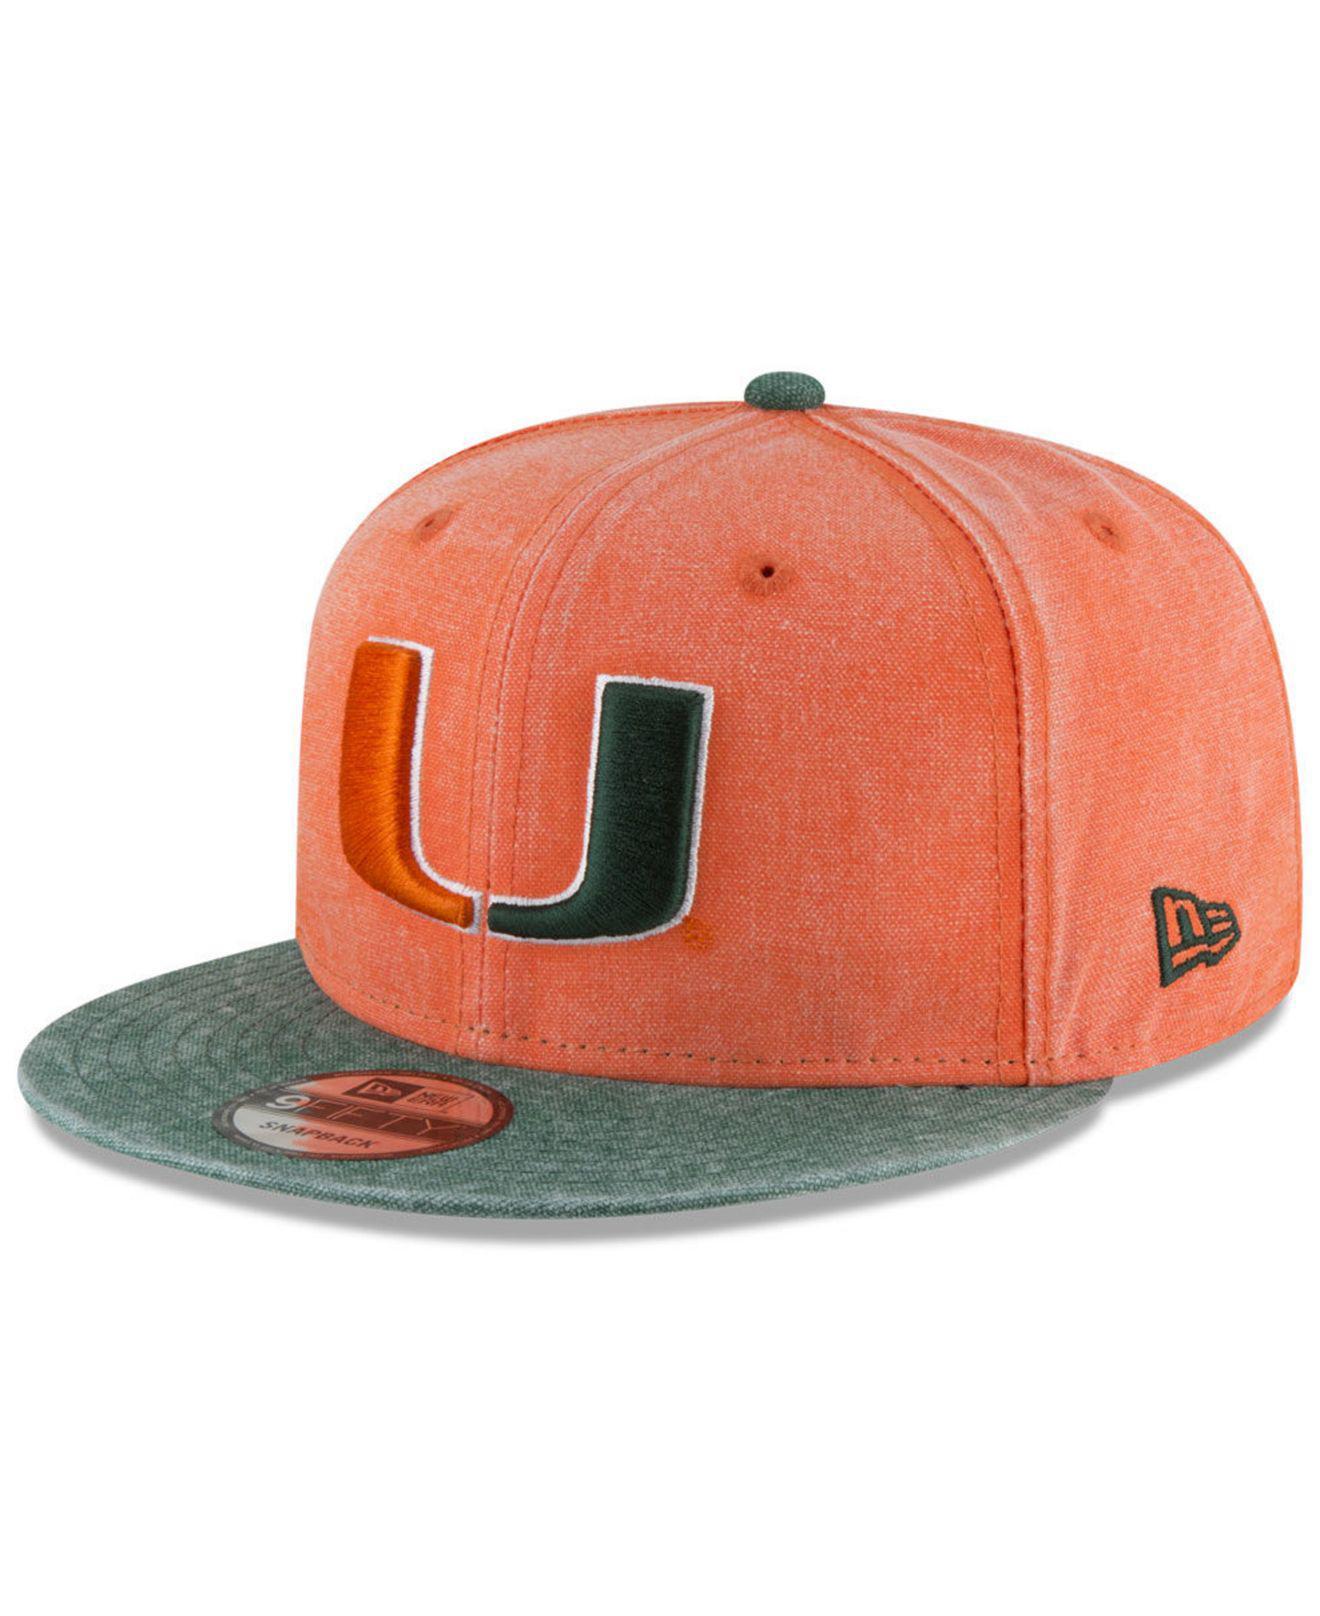 100% authentic 8f9d1 d00ea Lyst - KTZ Miami Hurricanes Rugged Canvas Snapback Cap in Orange for Men